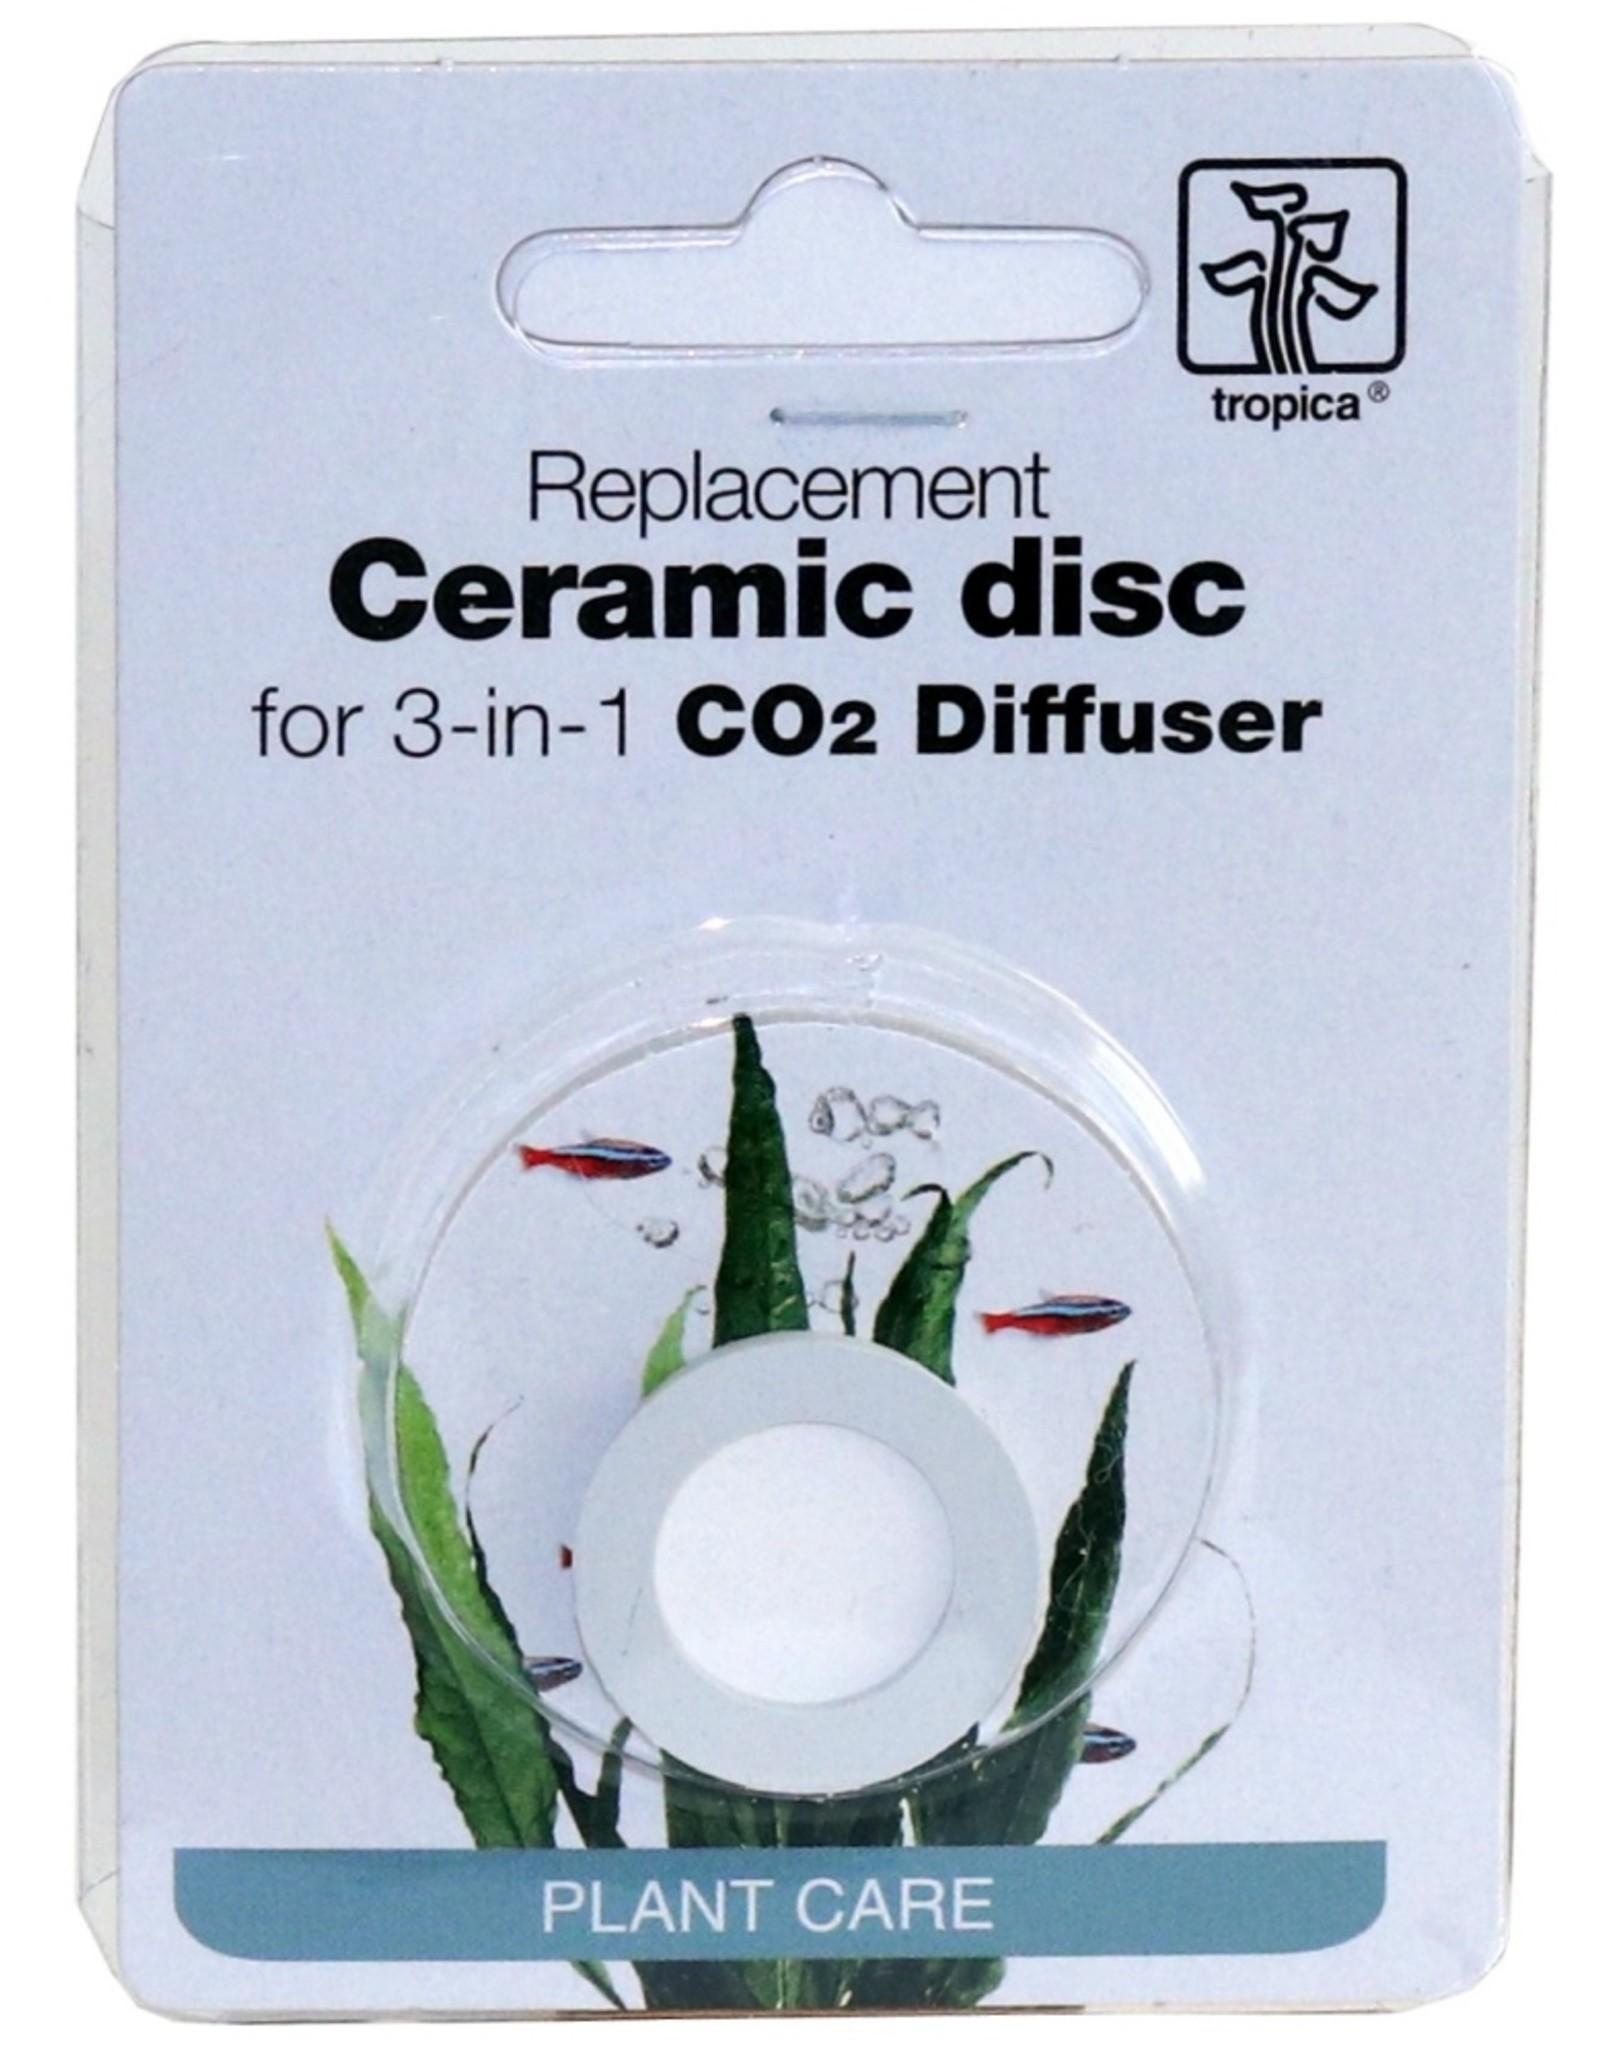 Tropica TROPICA Replacement Ceramic Disc for 3-in-1 CO2 Diffuser